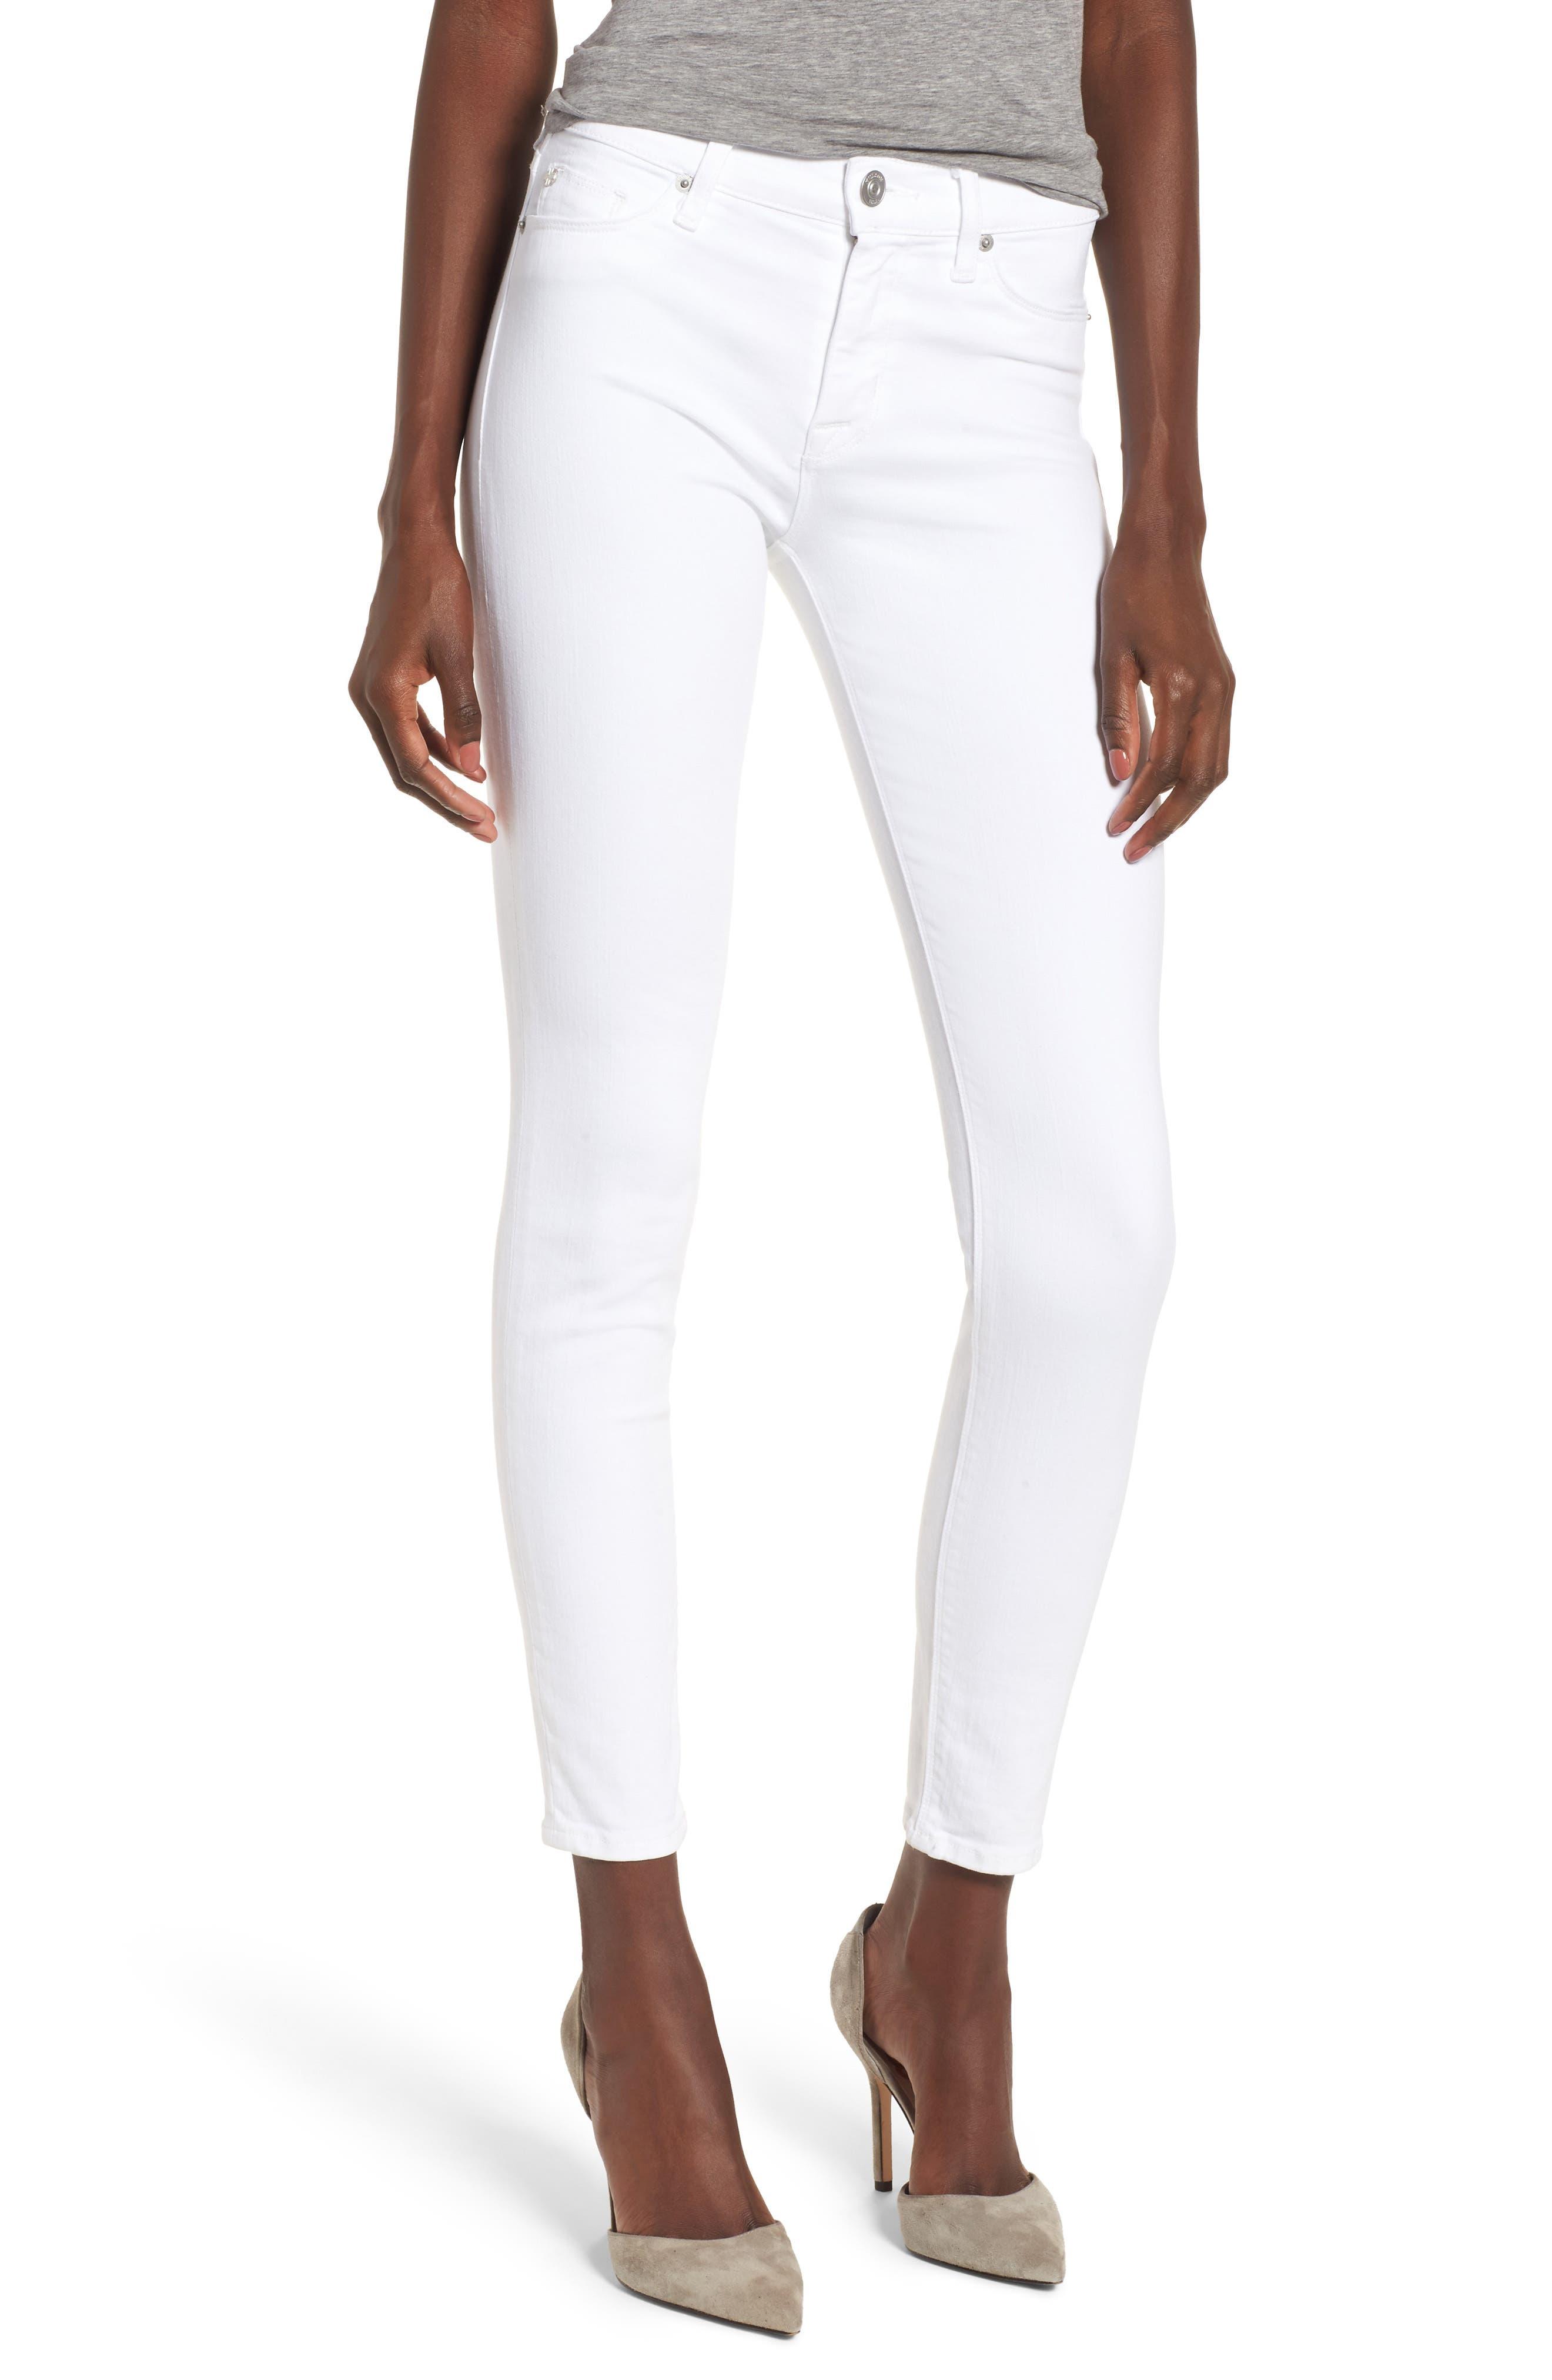 Main Image - Hudson Jeans Ankle Super Skinny Jeans (Optical White)